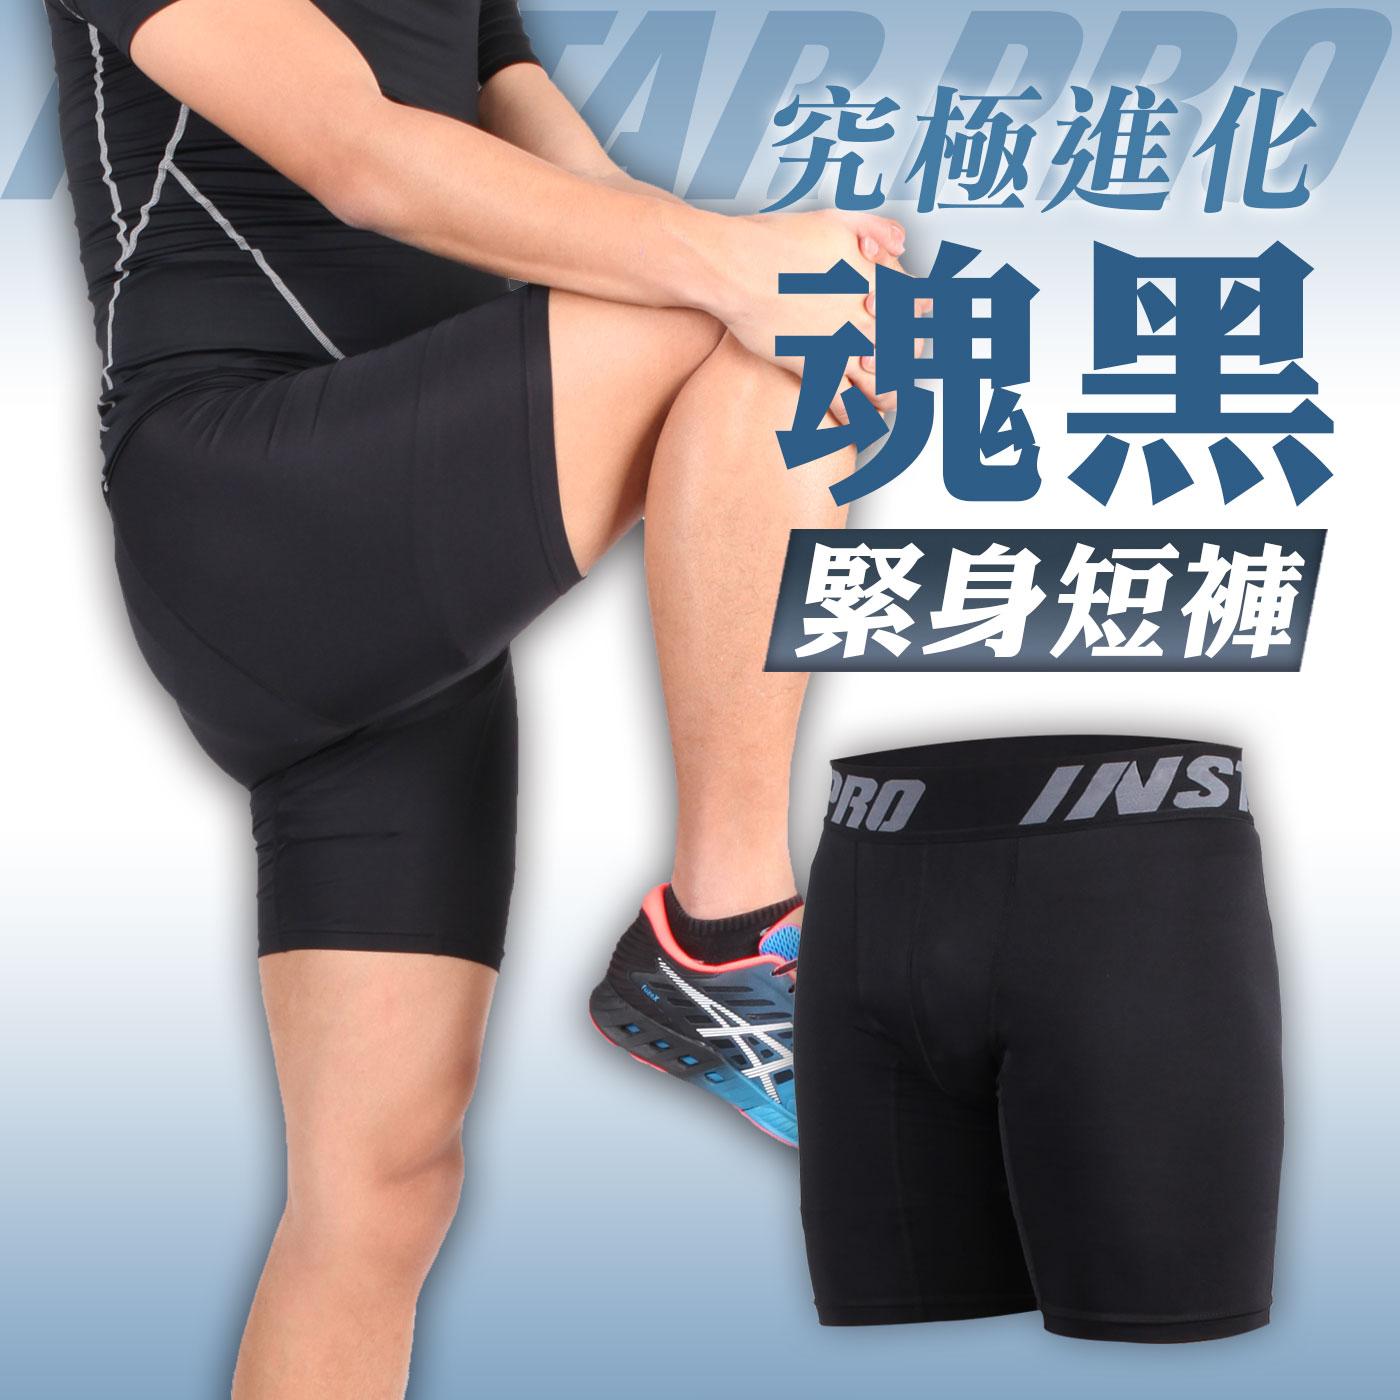 INSTAR PRO 男女魂黑緊身短褲(健身 路跑 緊身褲 內搭褲 束褲【06360484】≡排汗專家≡